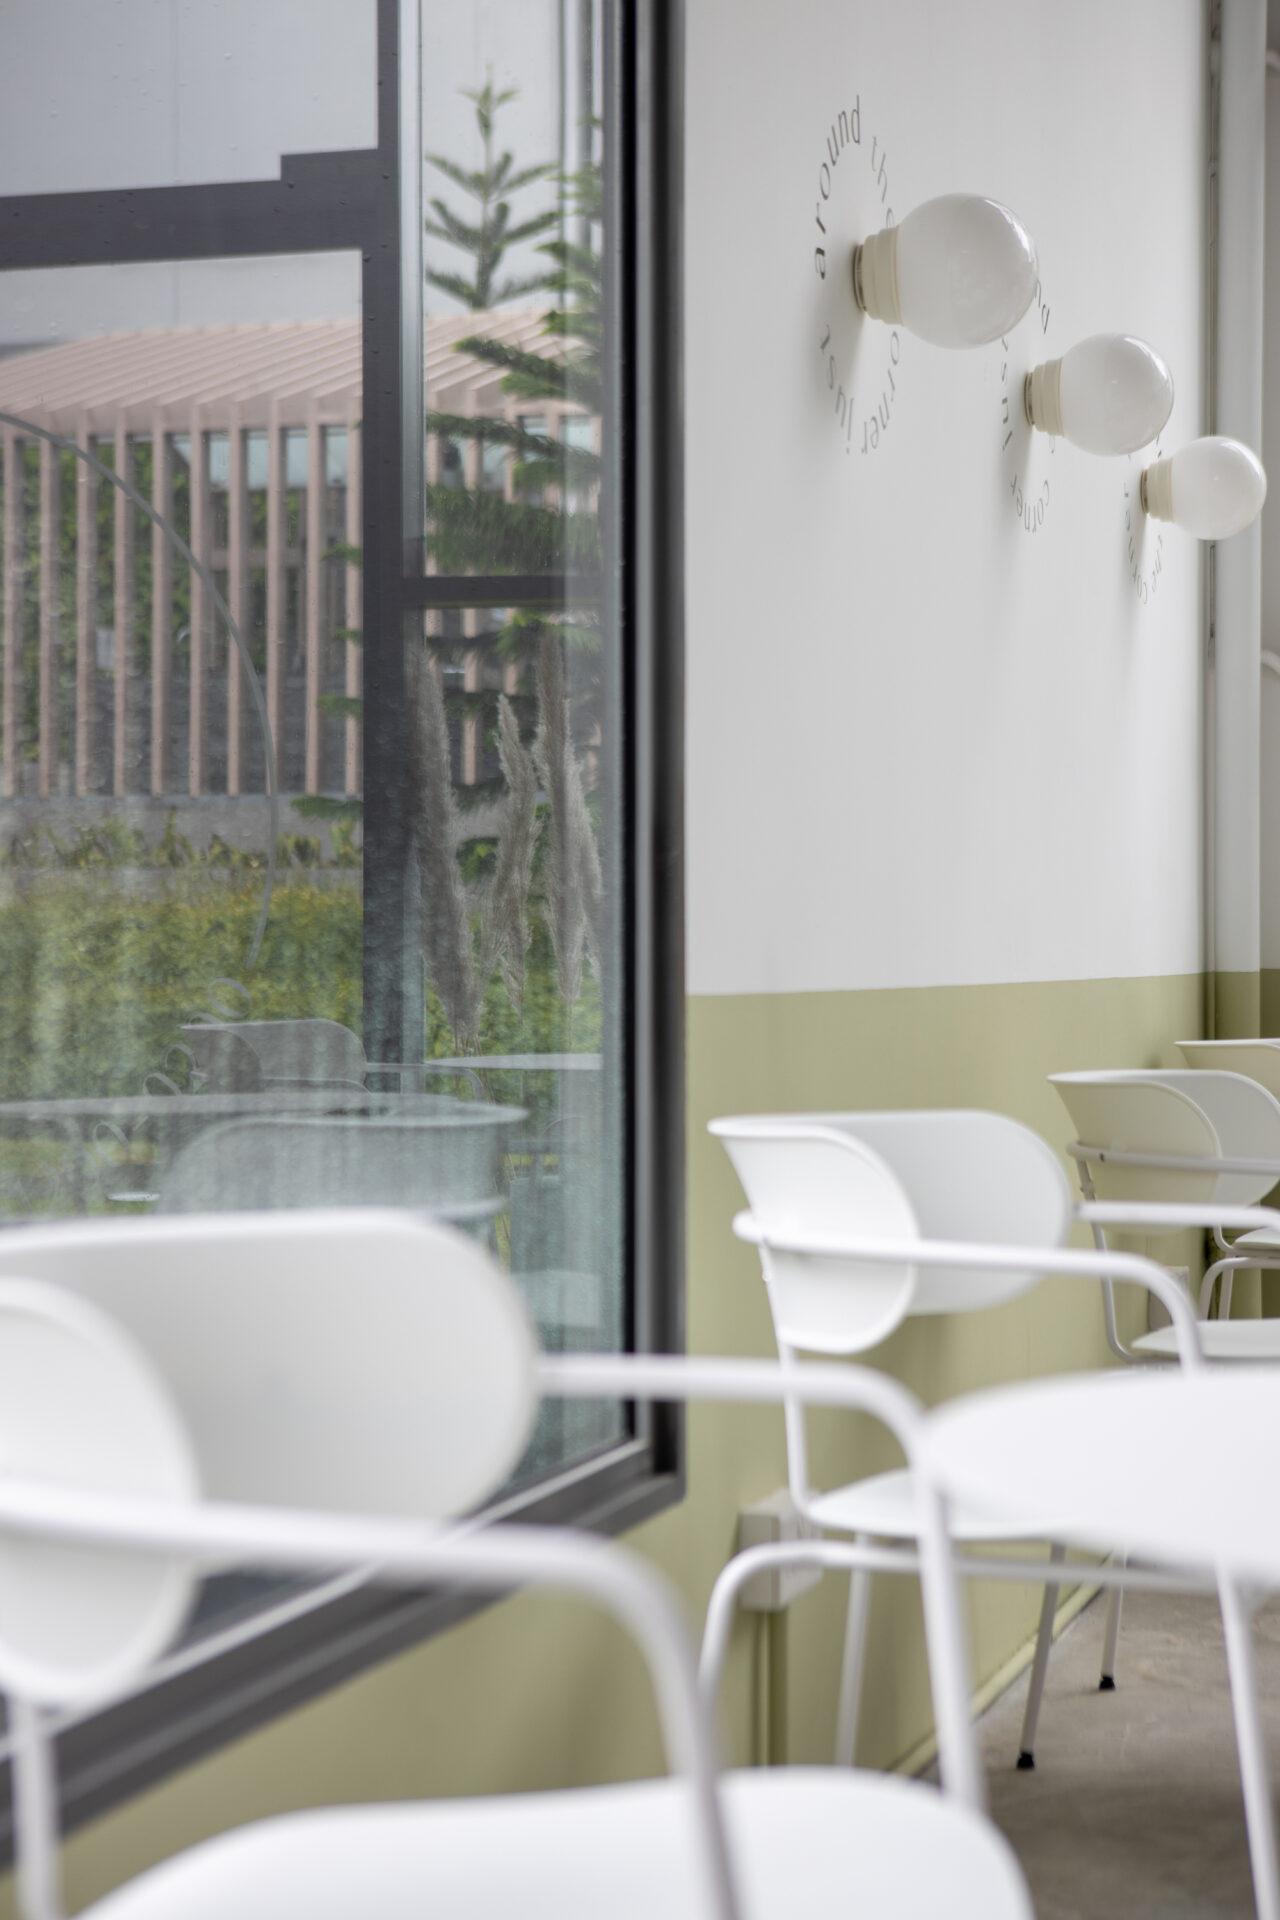 ascend design ice cream waffles cafe interior 3